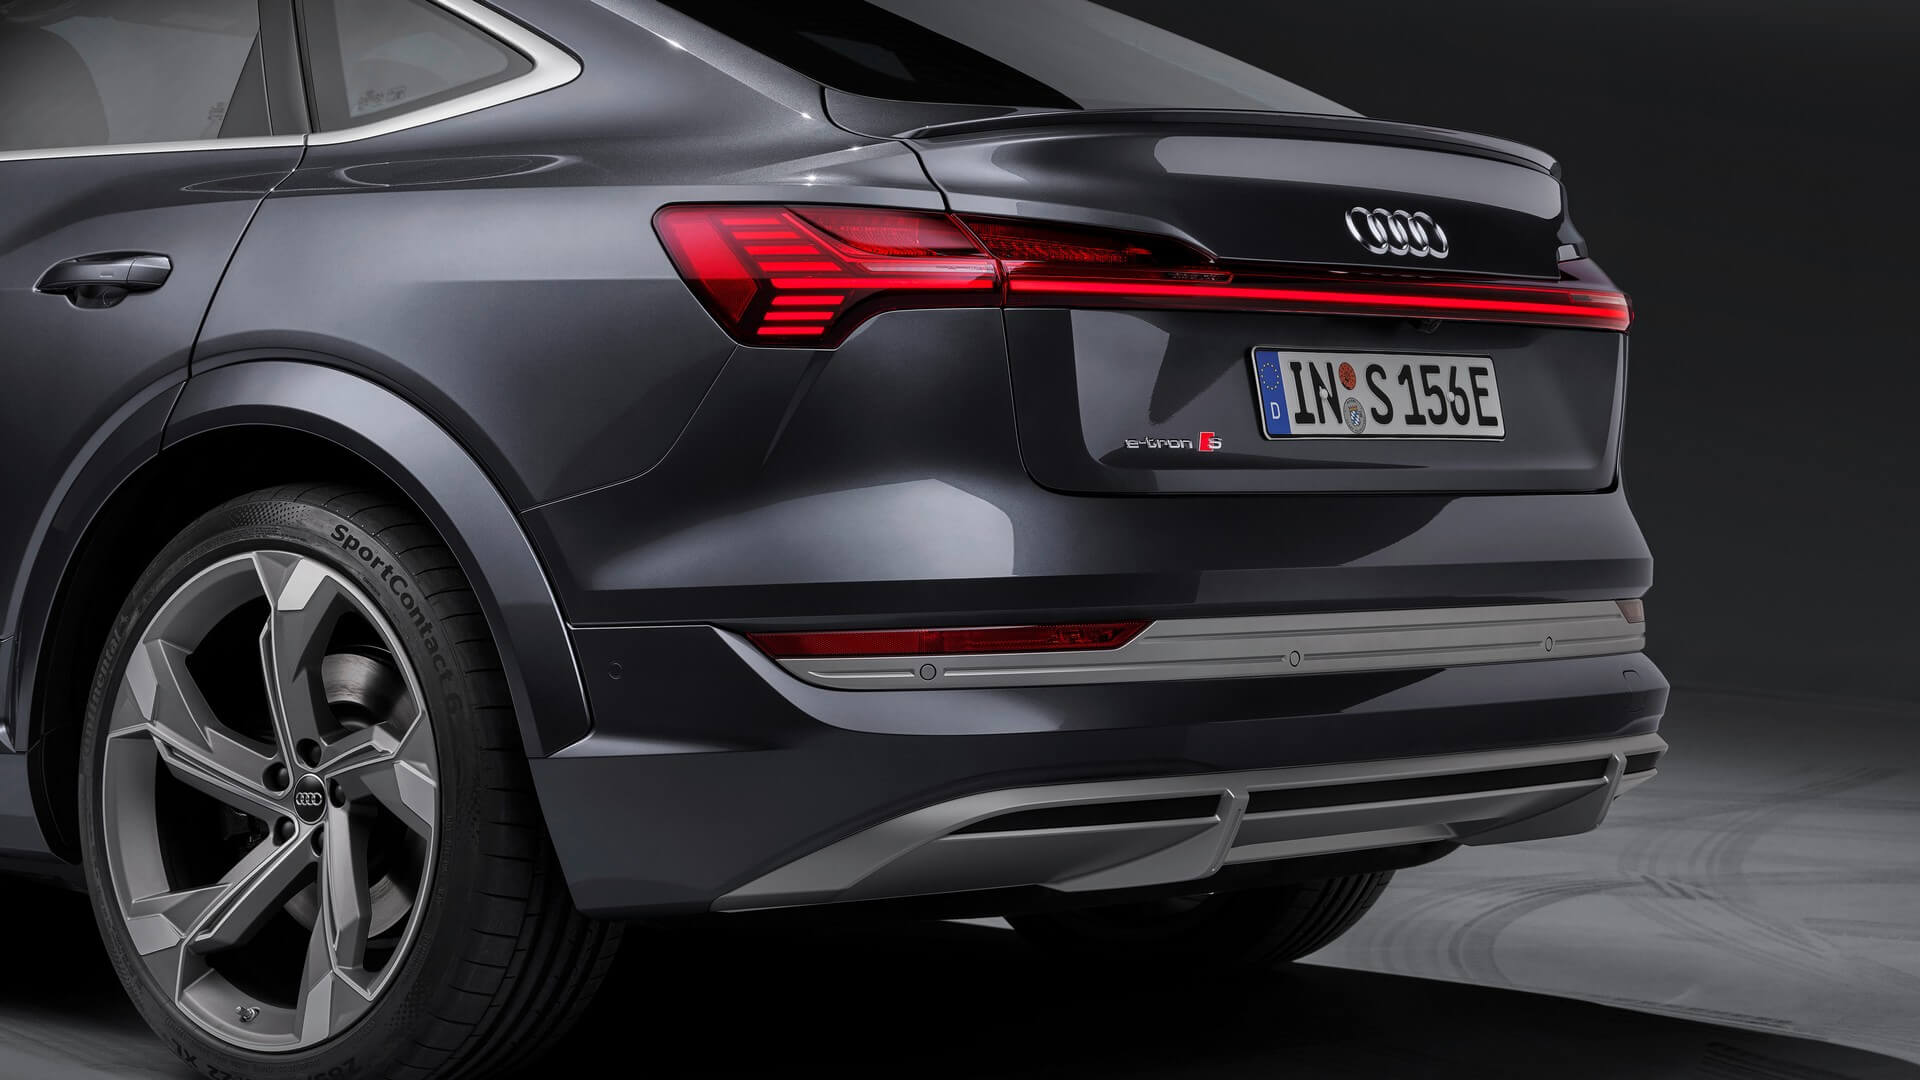 Audi-E-Tron-S-and-E-Tron-S-Sportback-2020-95